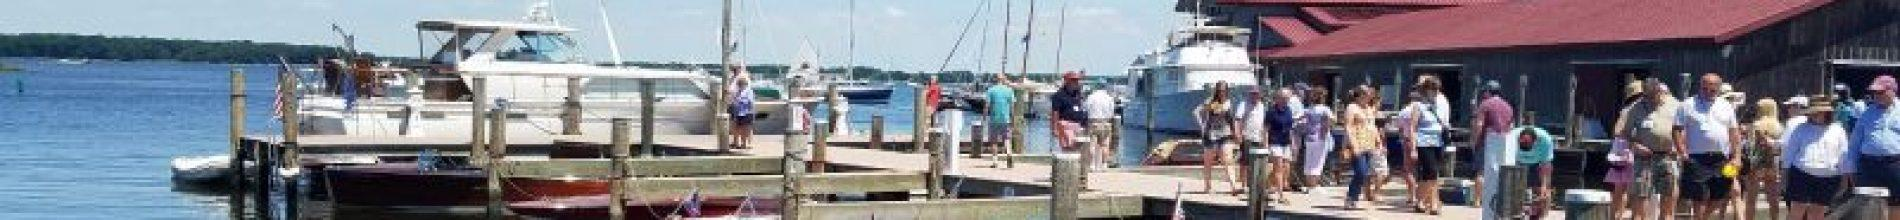 Chesapeake Bay ACBS